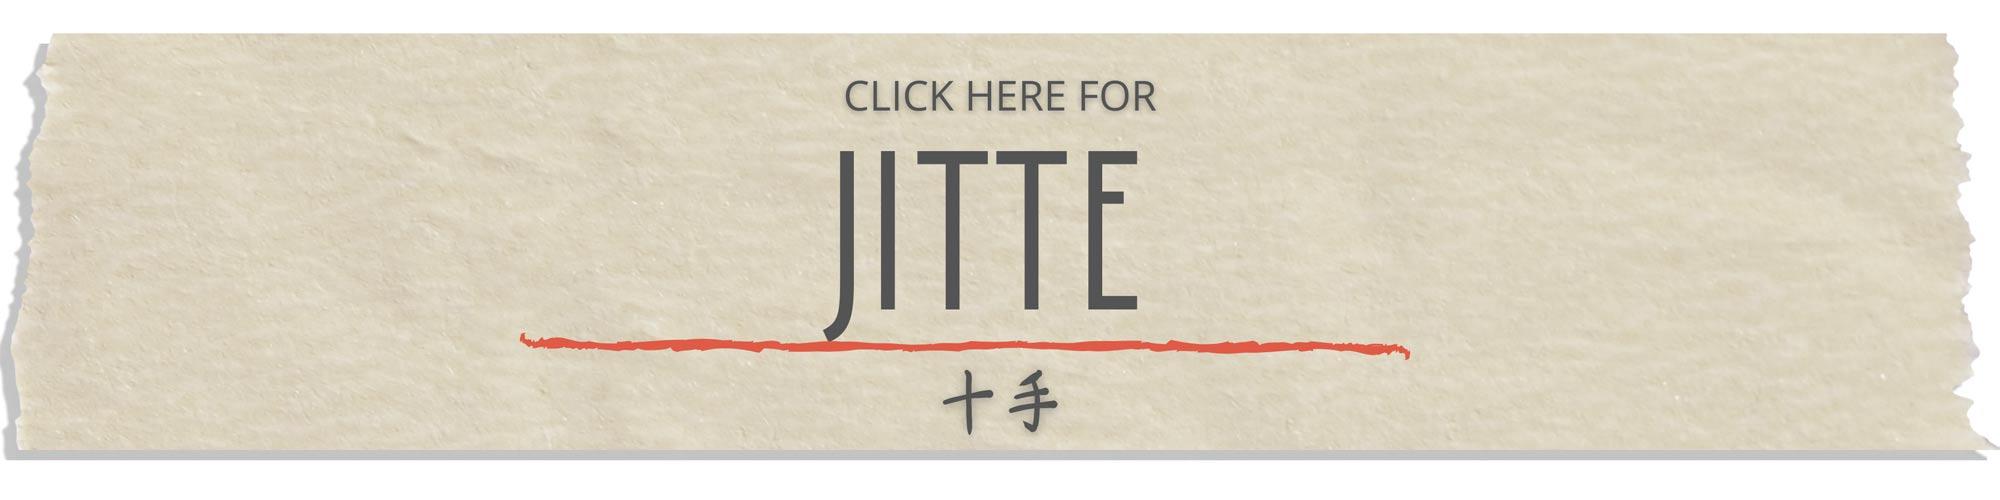 jitte tutorial